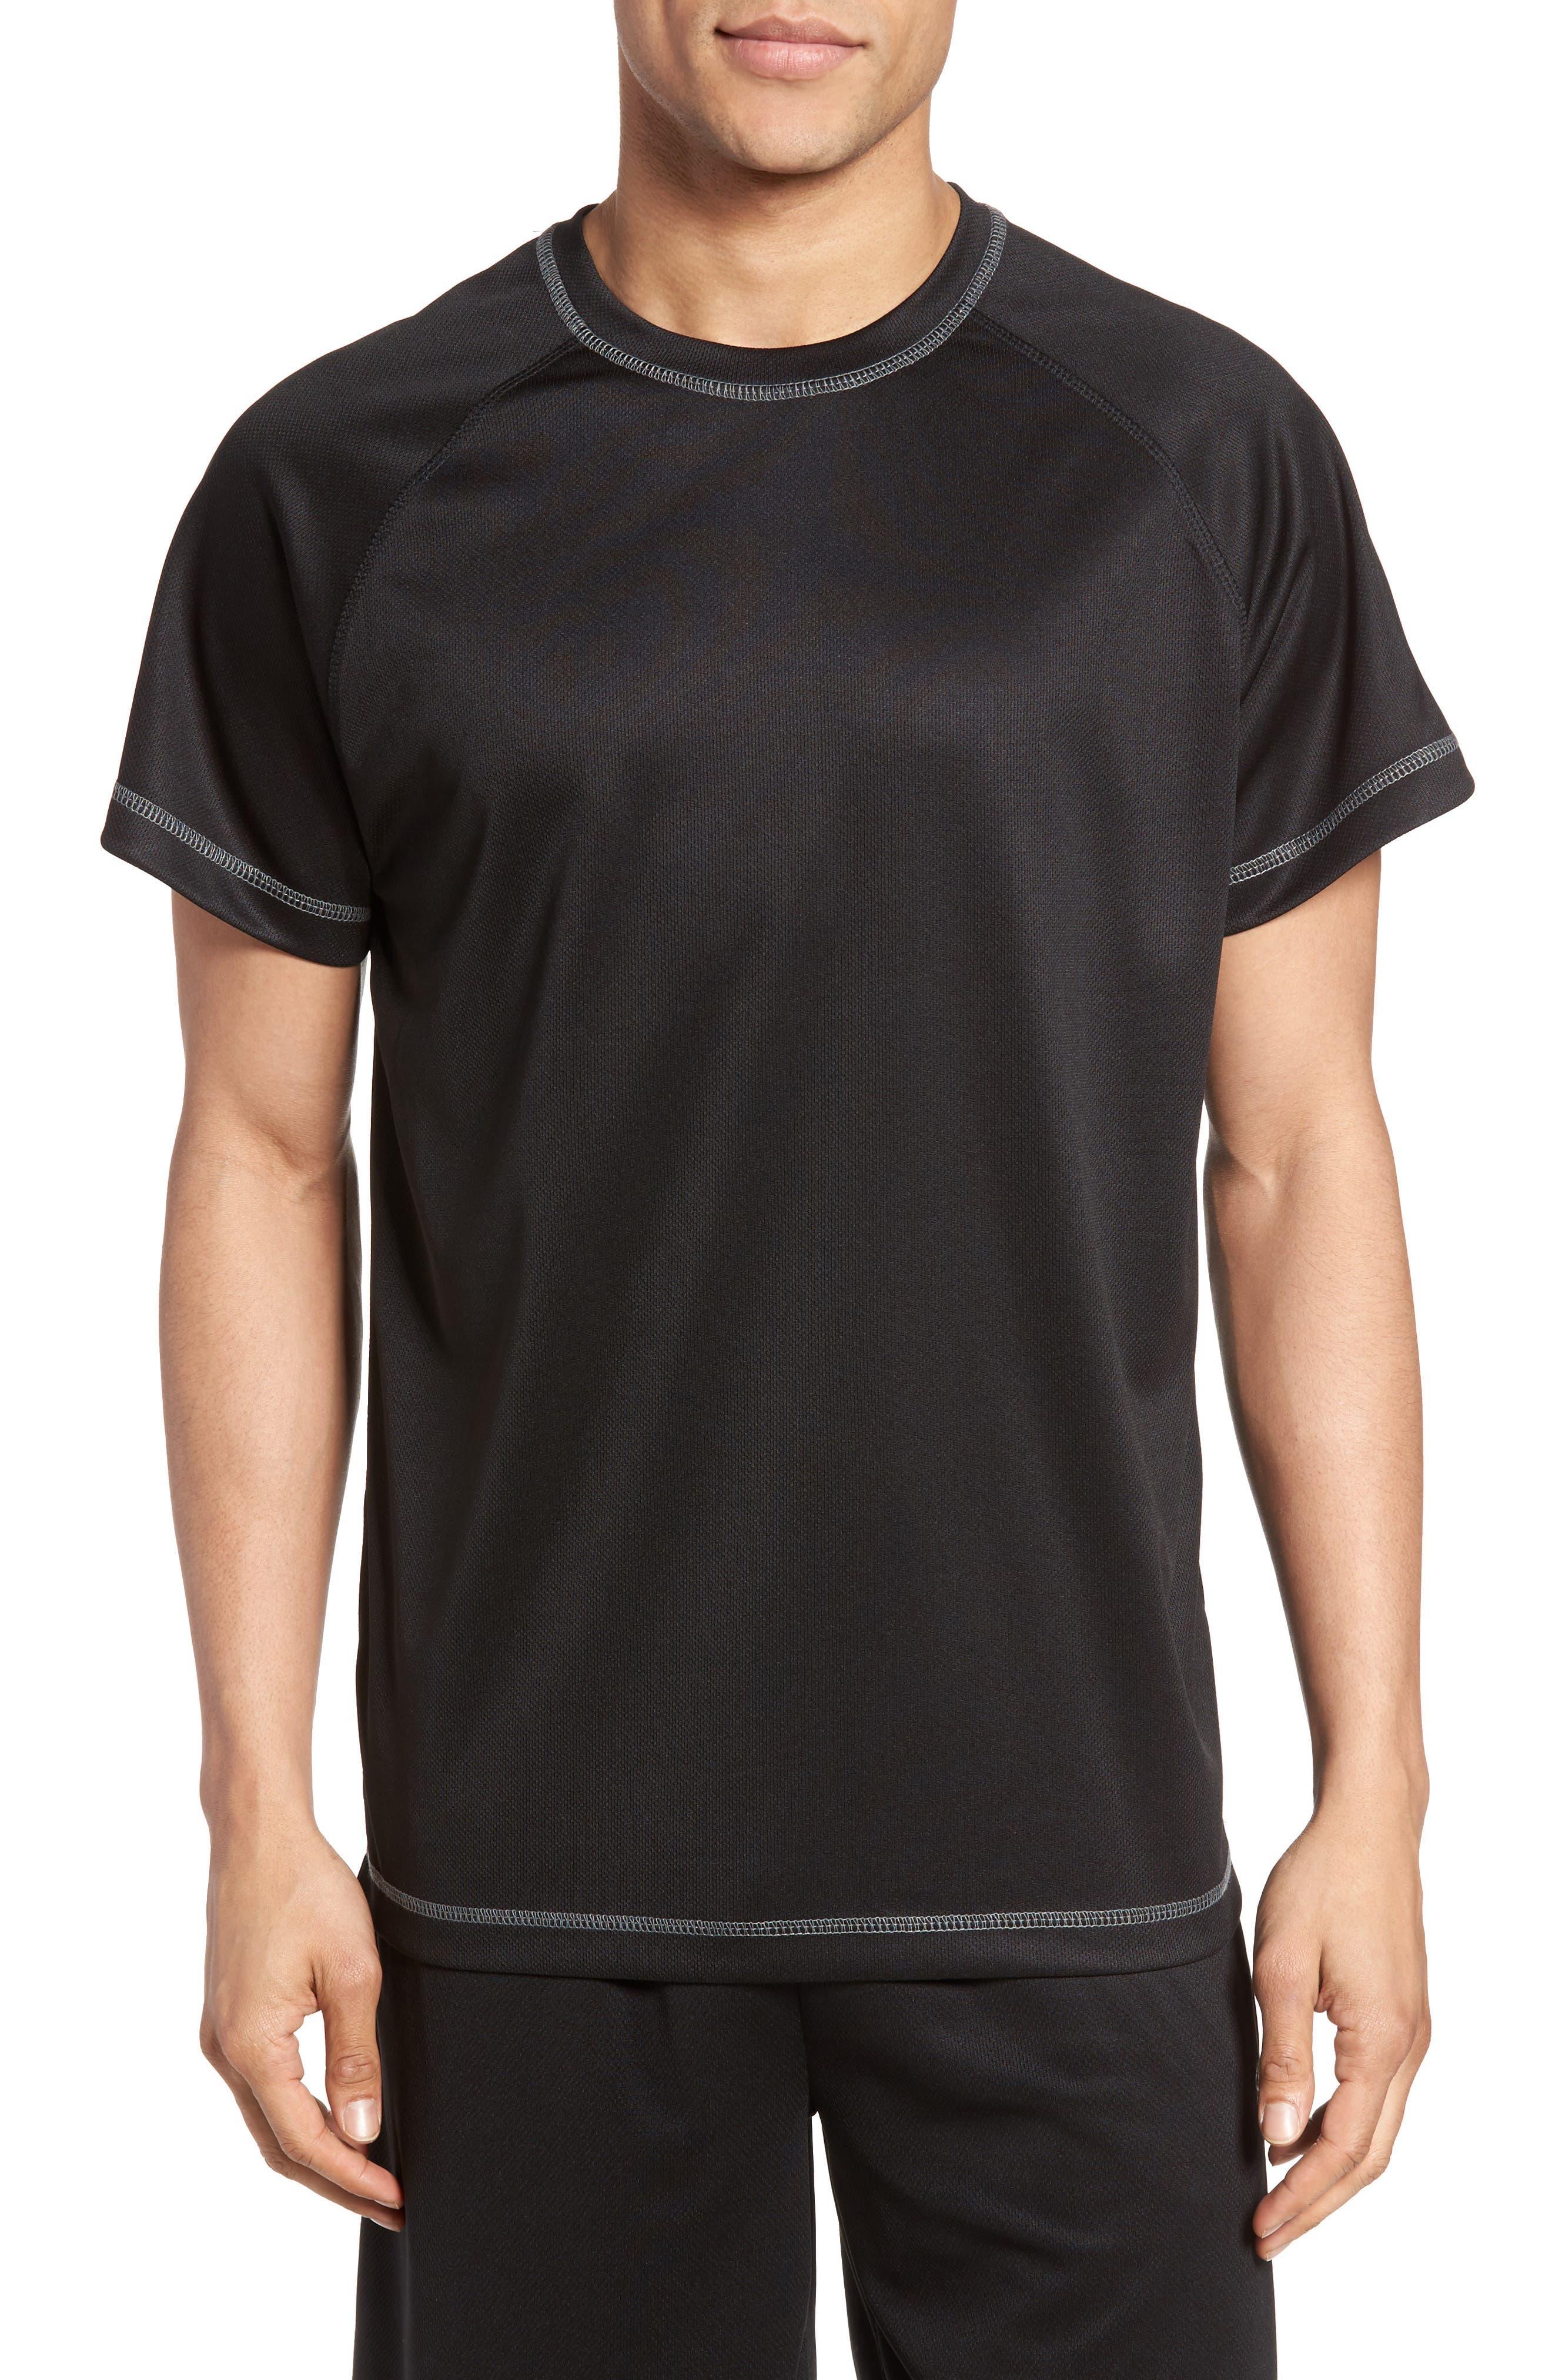 Work Out Crewneck T-Shirt,                             Main thumbnail 1, color,                             001